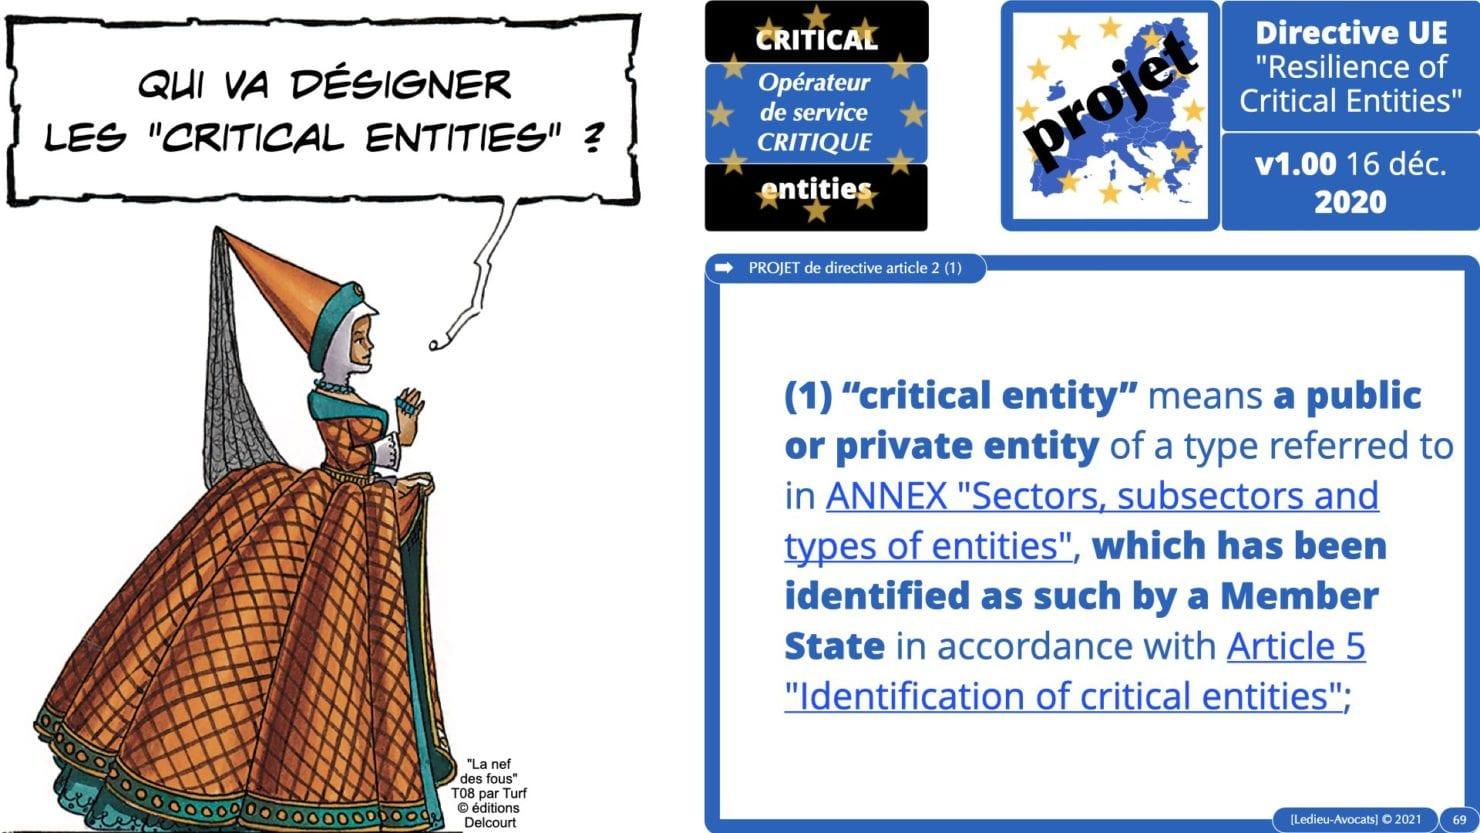 337 cyber sécurité #1 OIV OSE Critical Entities © Ledieu-avocat 15-06-2021.069